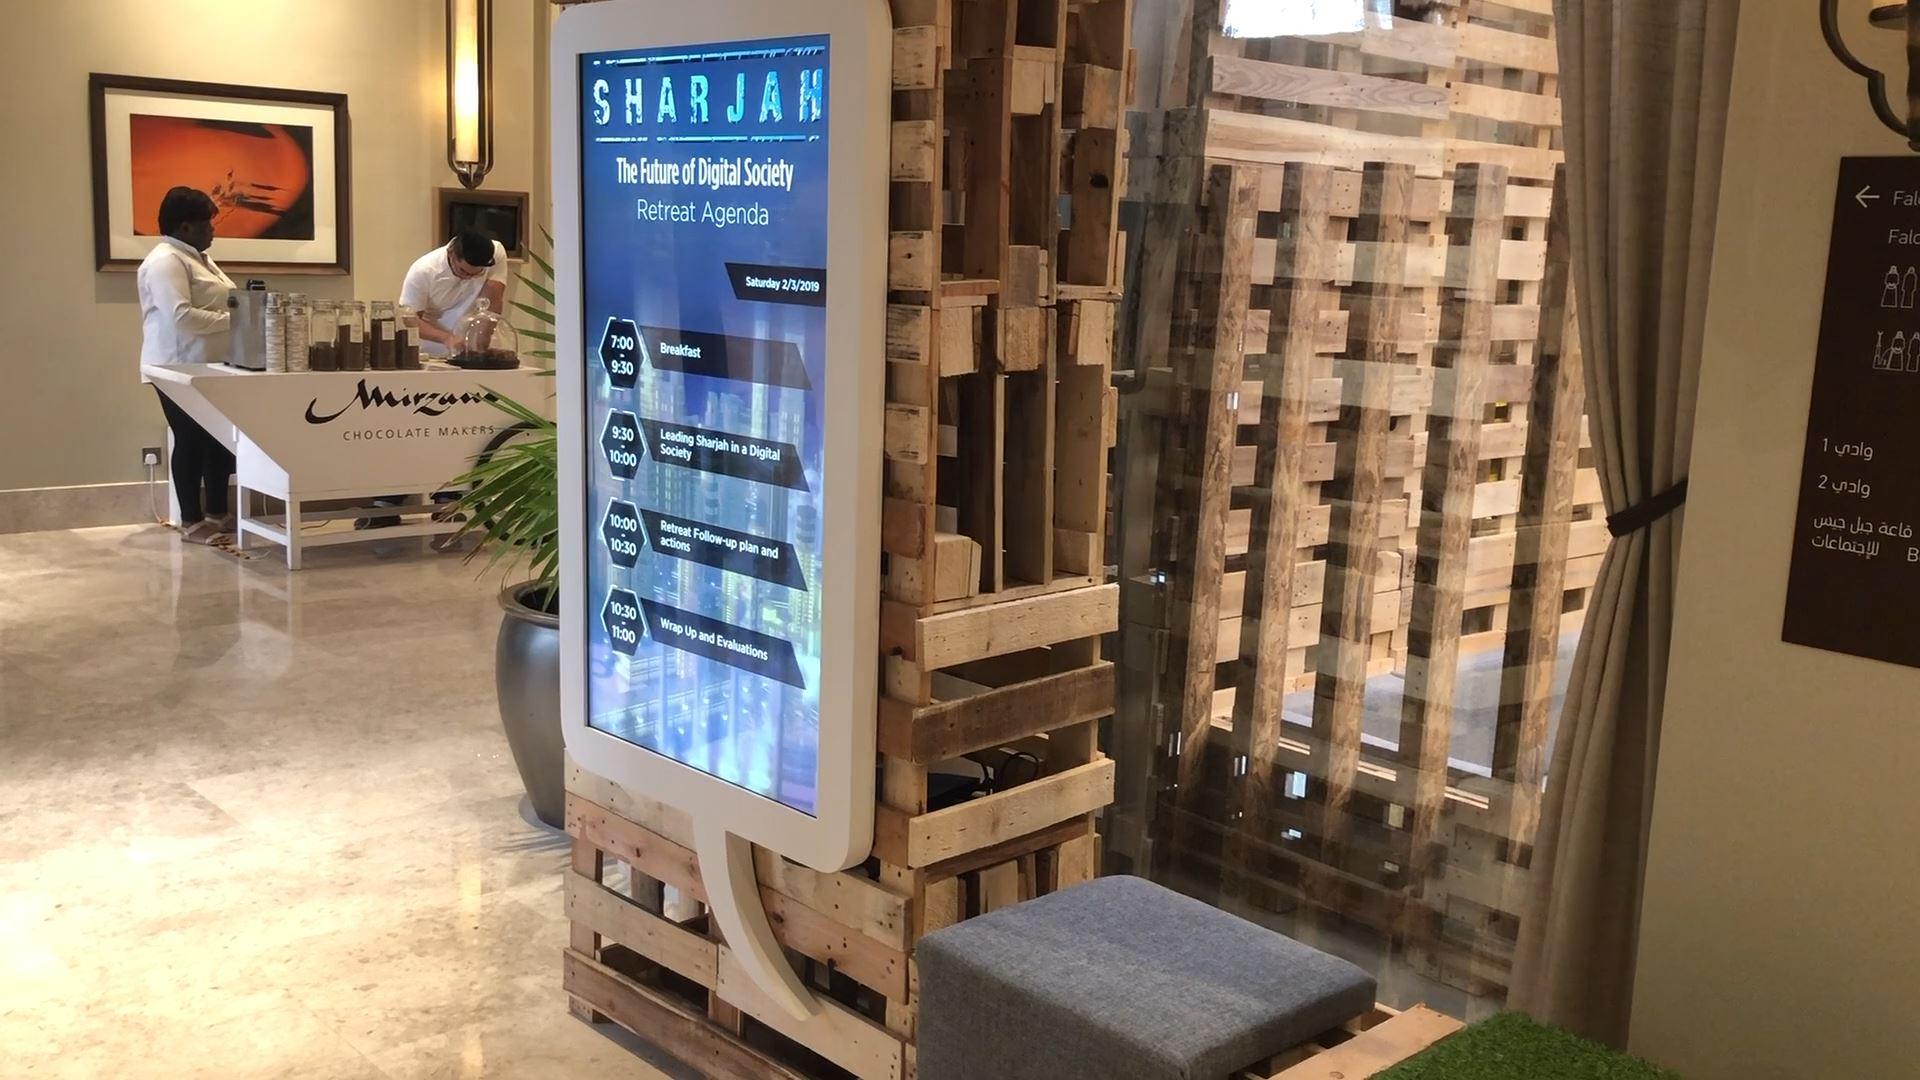 sharjah e-Government retreat interactive technology integration agenda screen